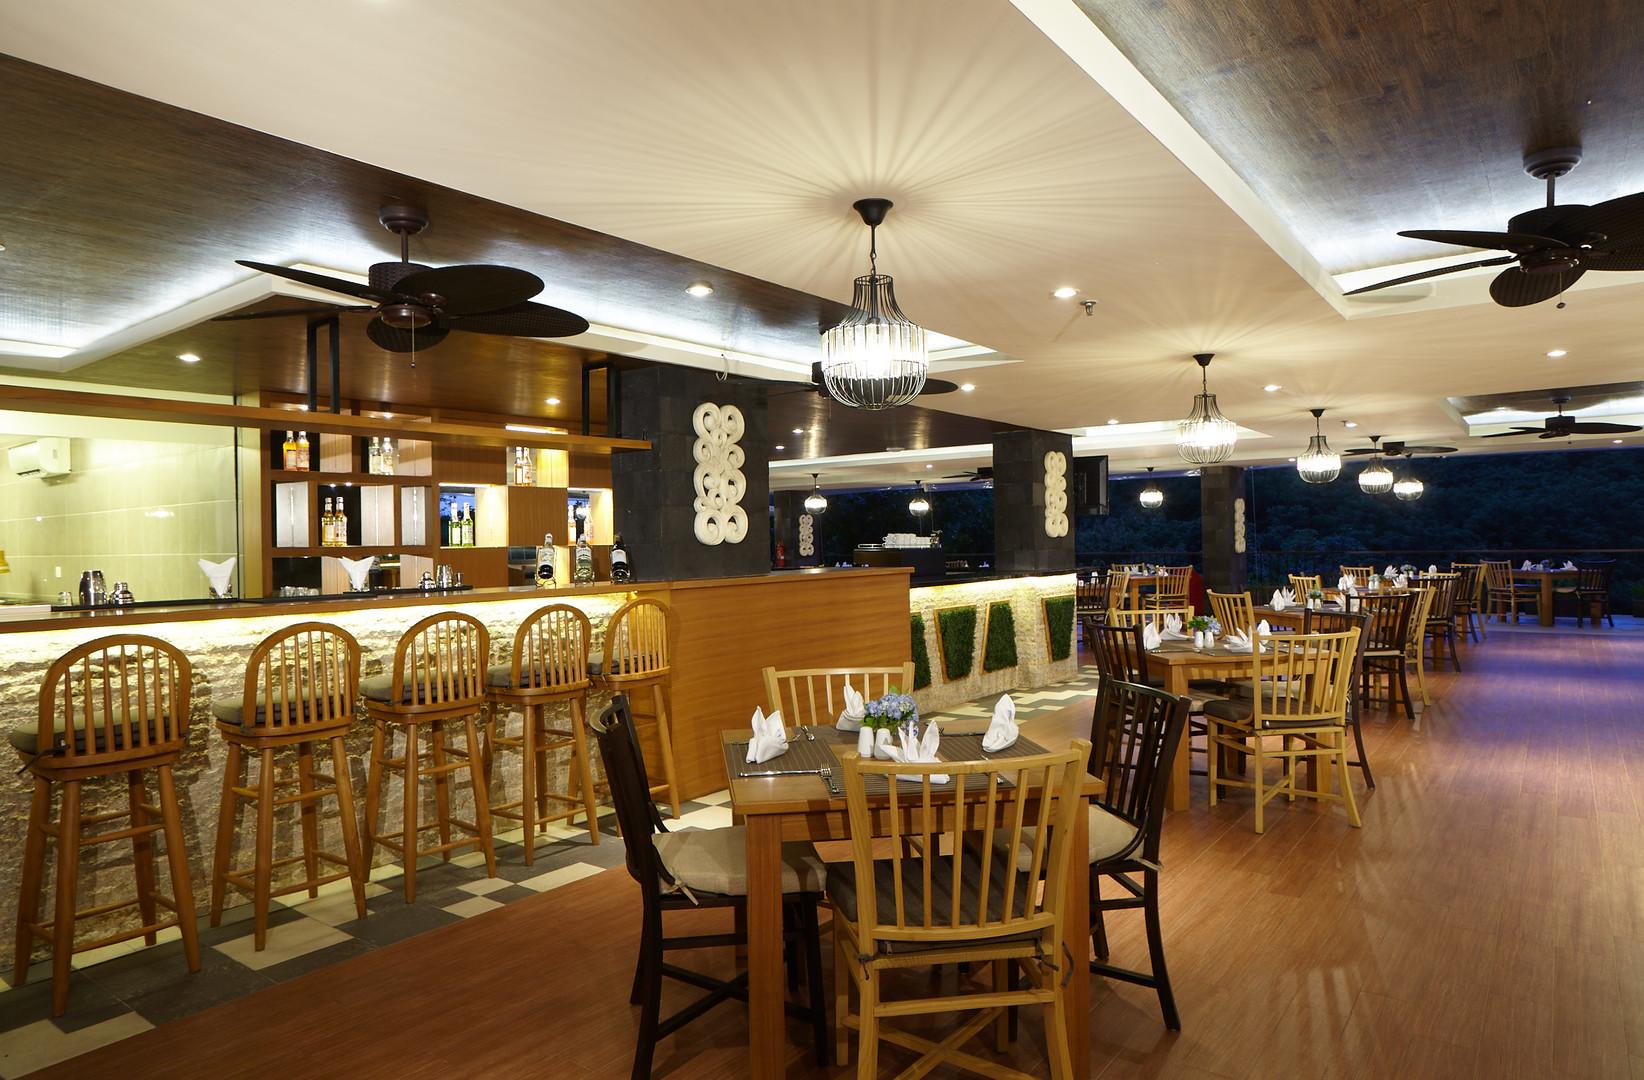 7. Dreamland Cafe - Wyndham Dreamland Re